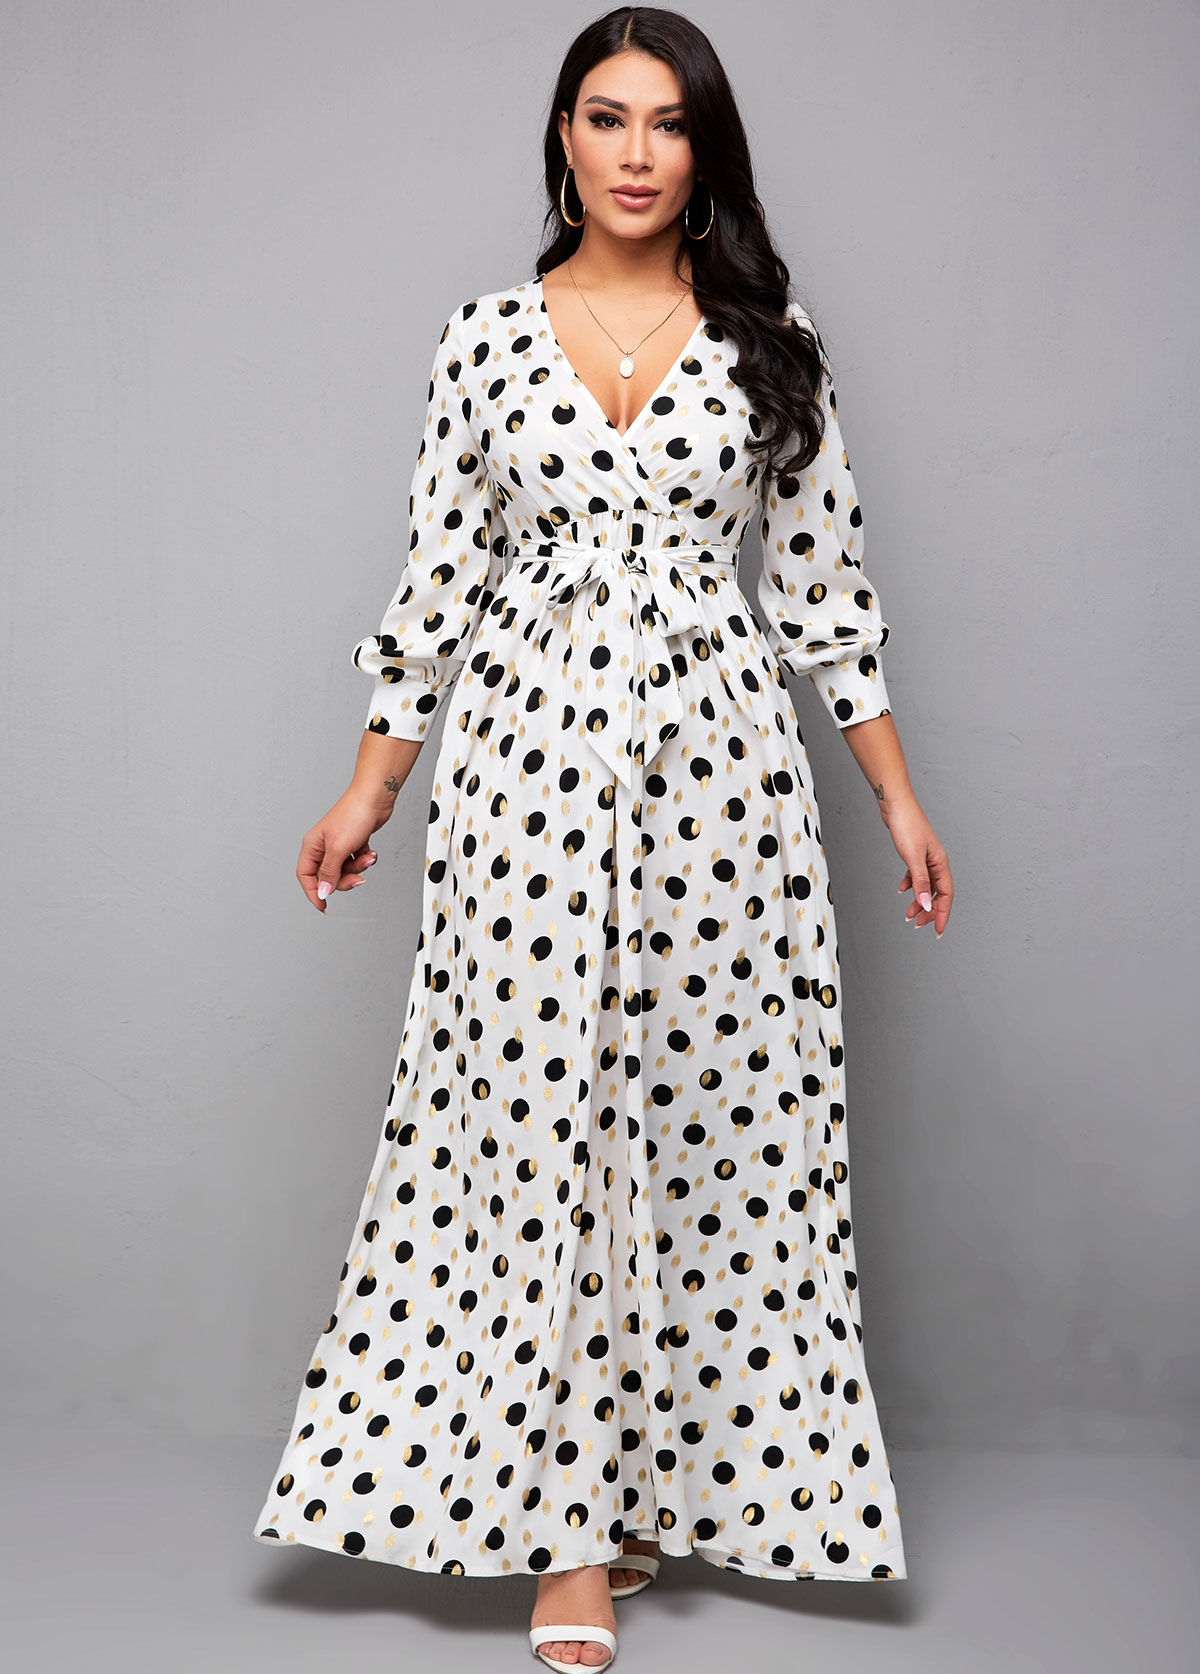 Hot Stamping Polka Dot Belted Dress